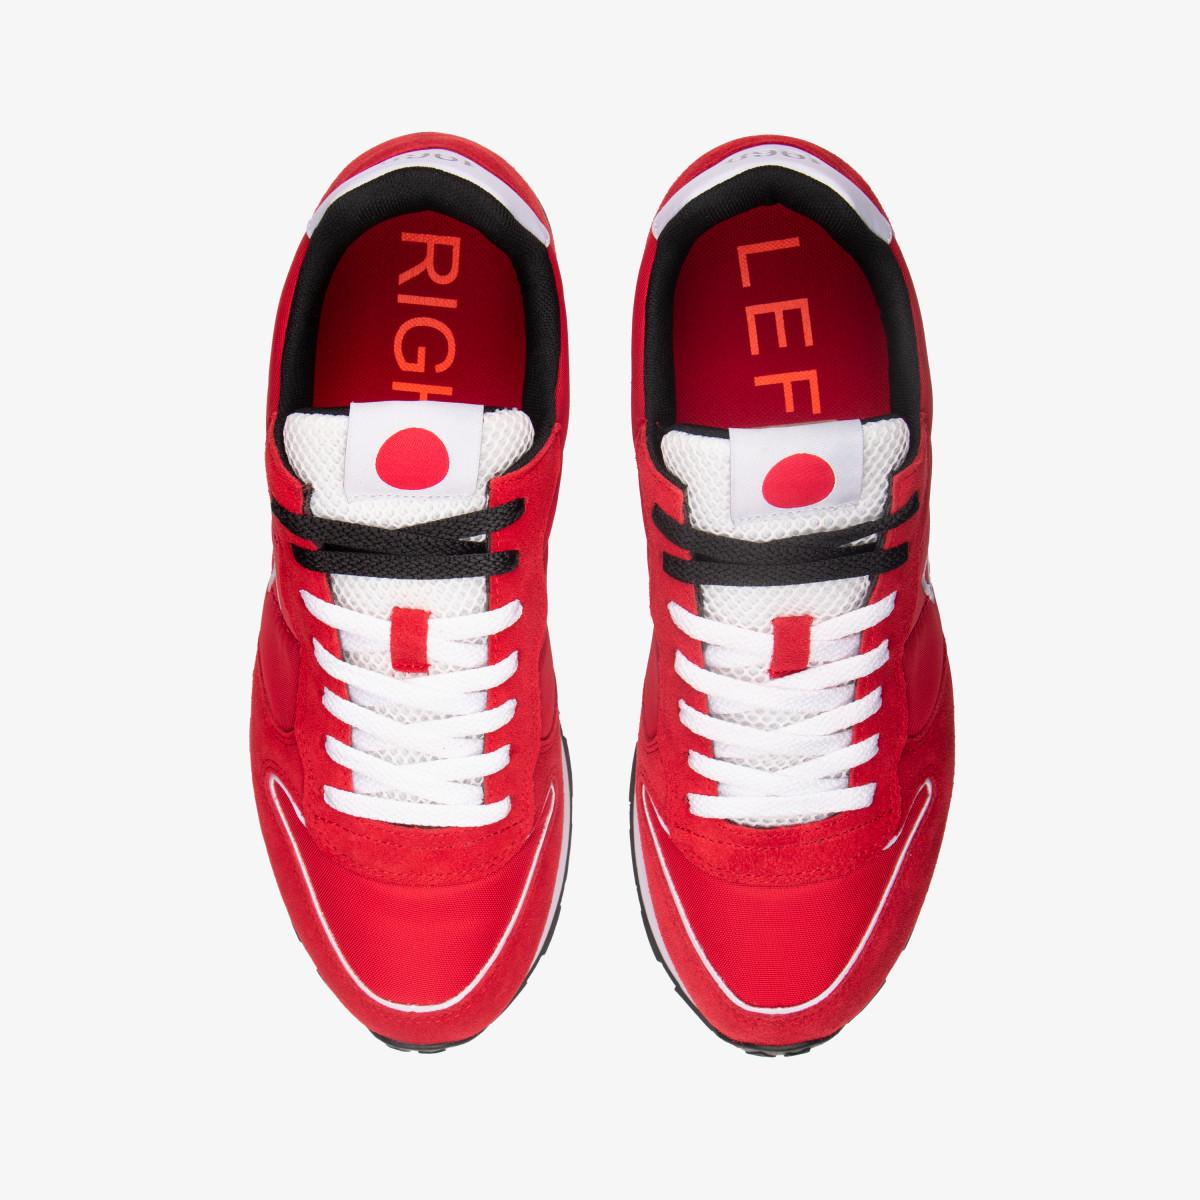 TOM JAPAN RED